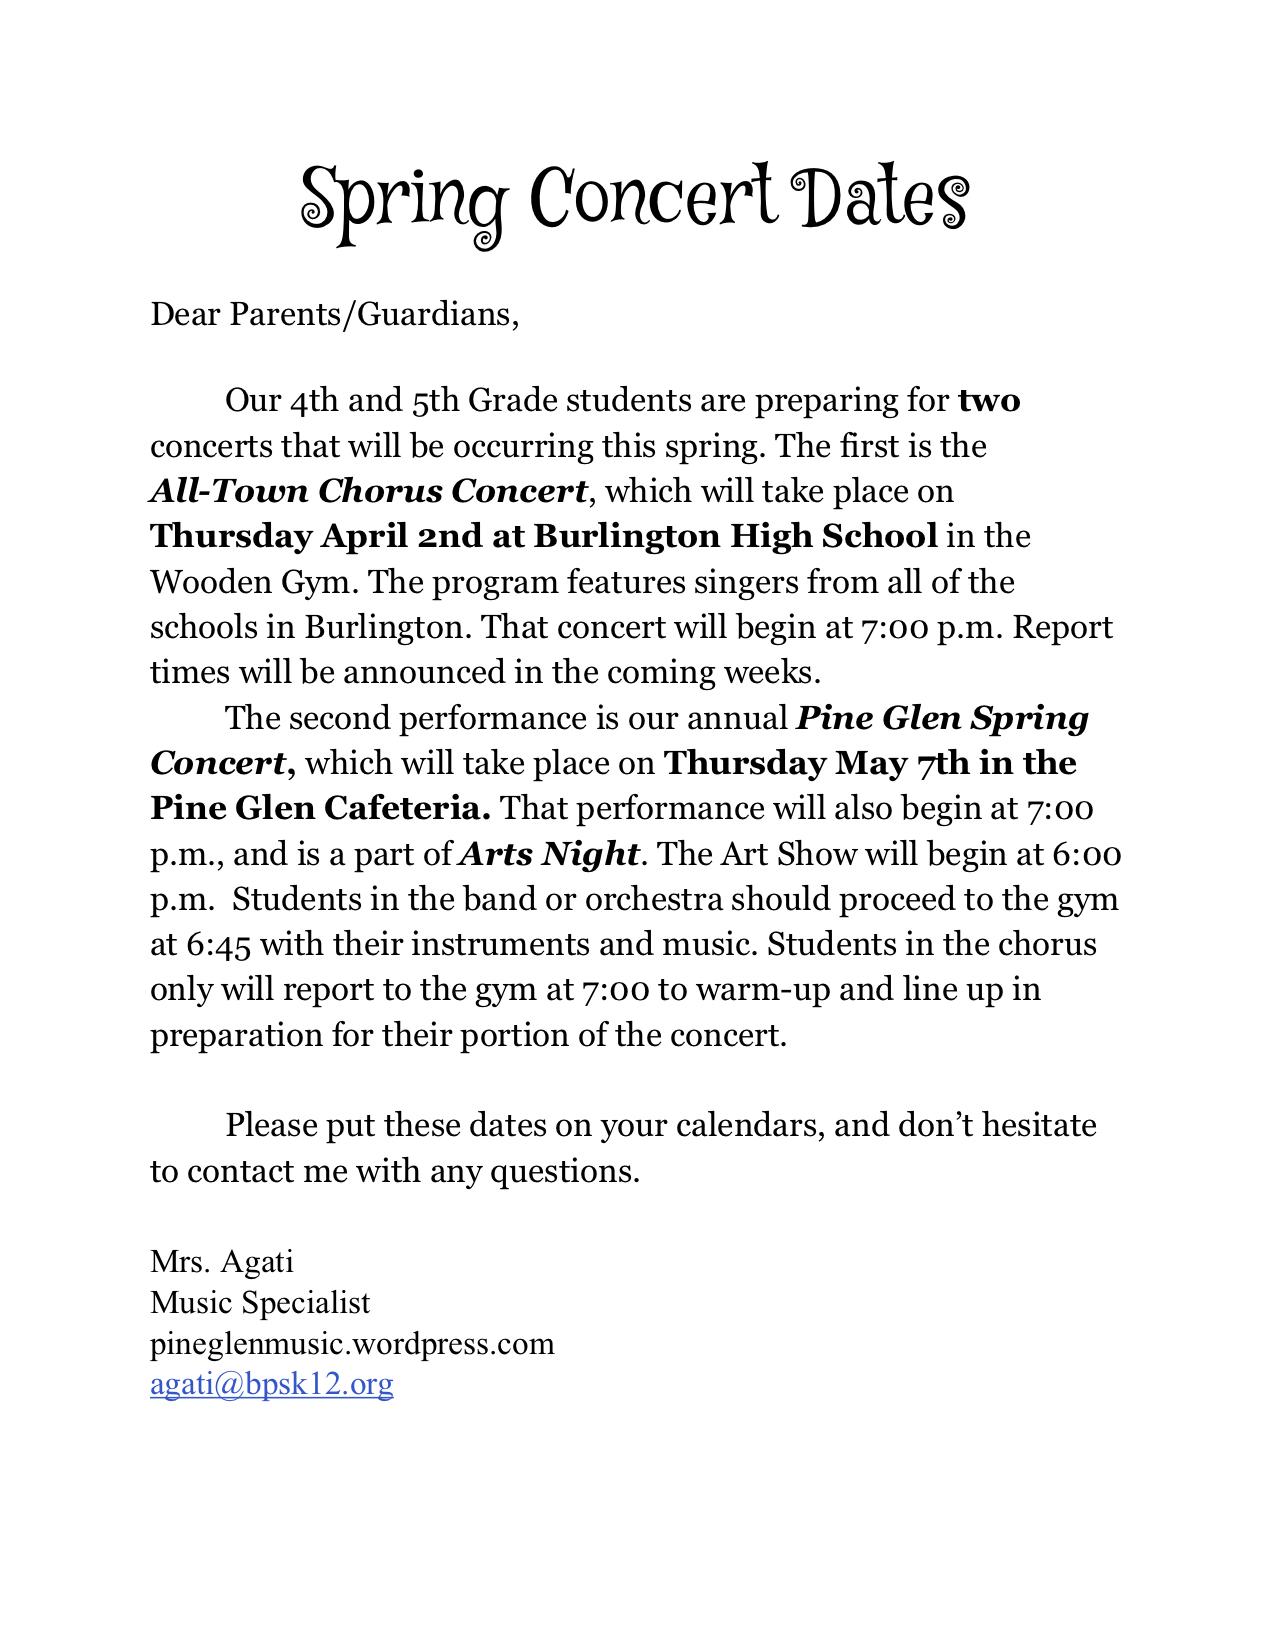 Spring Concert Dates 2019